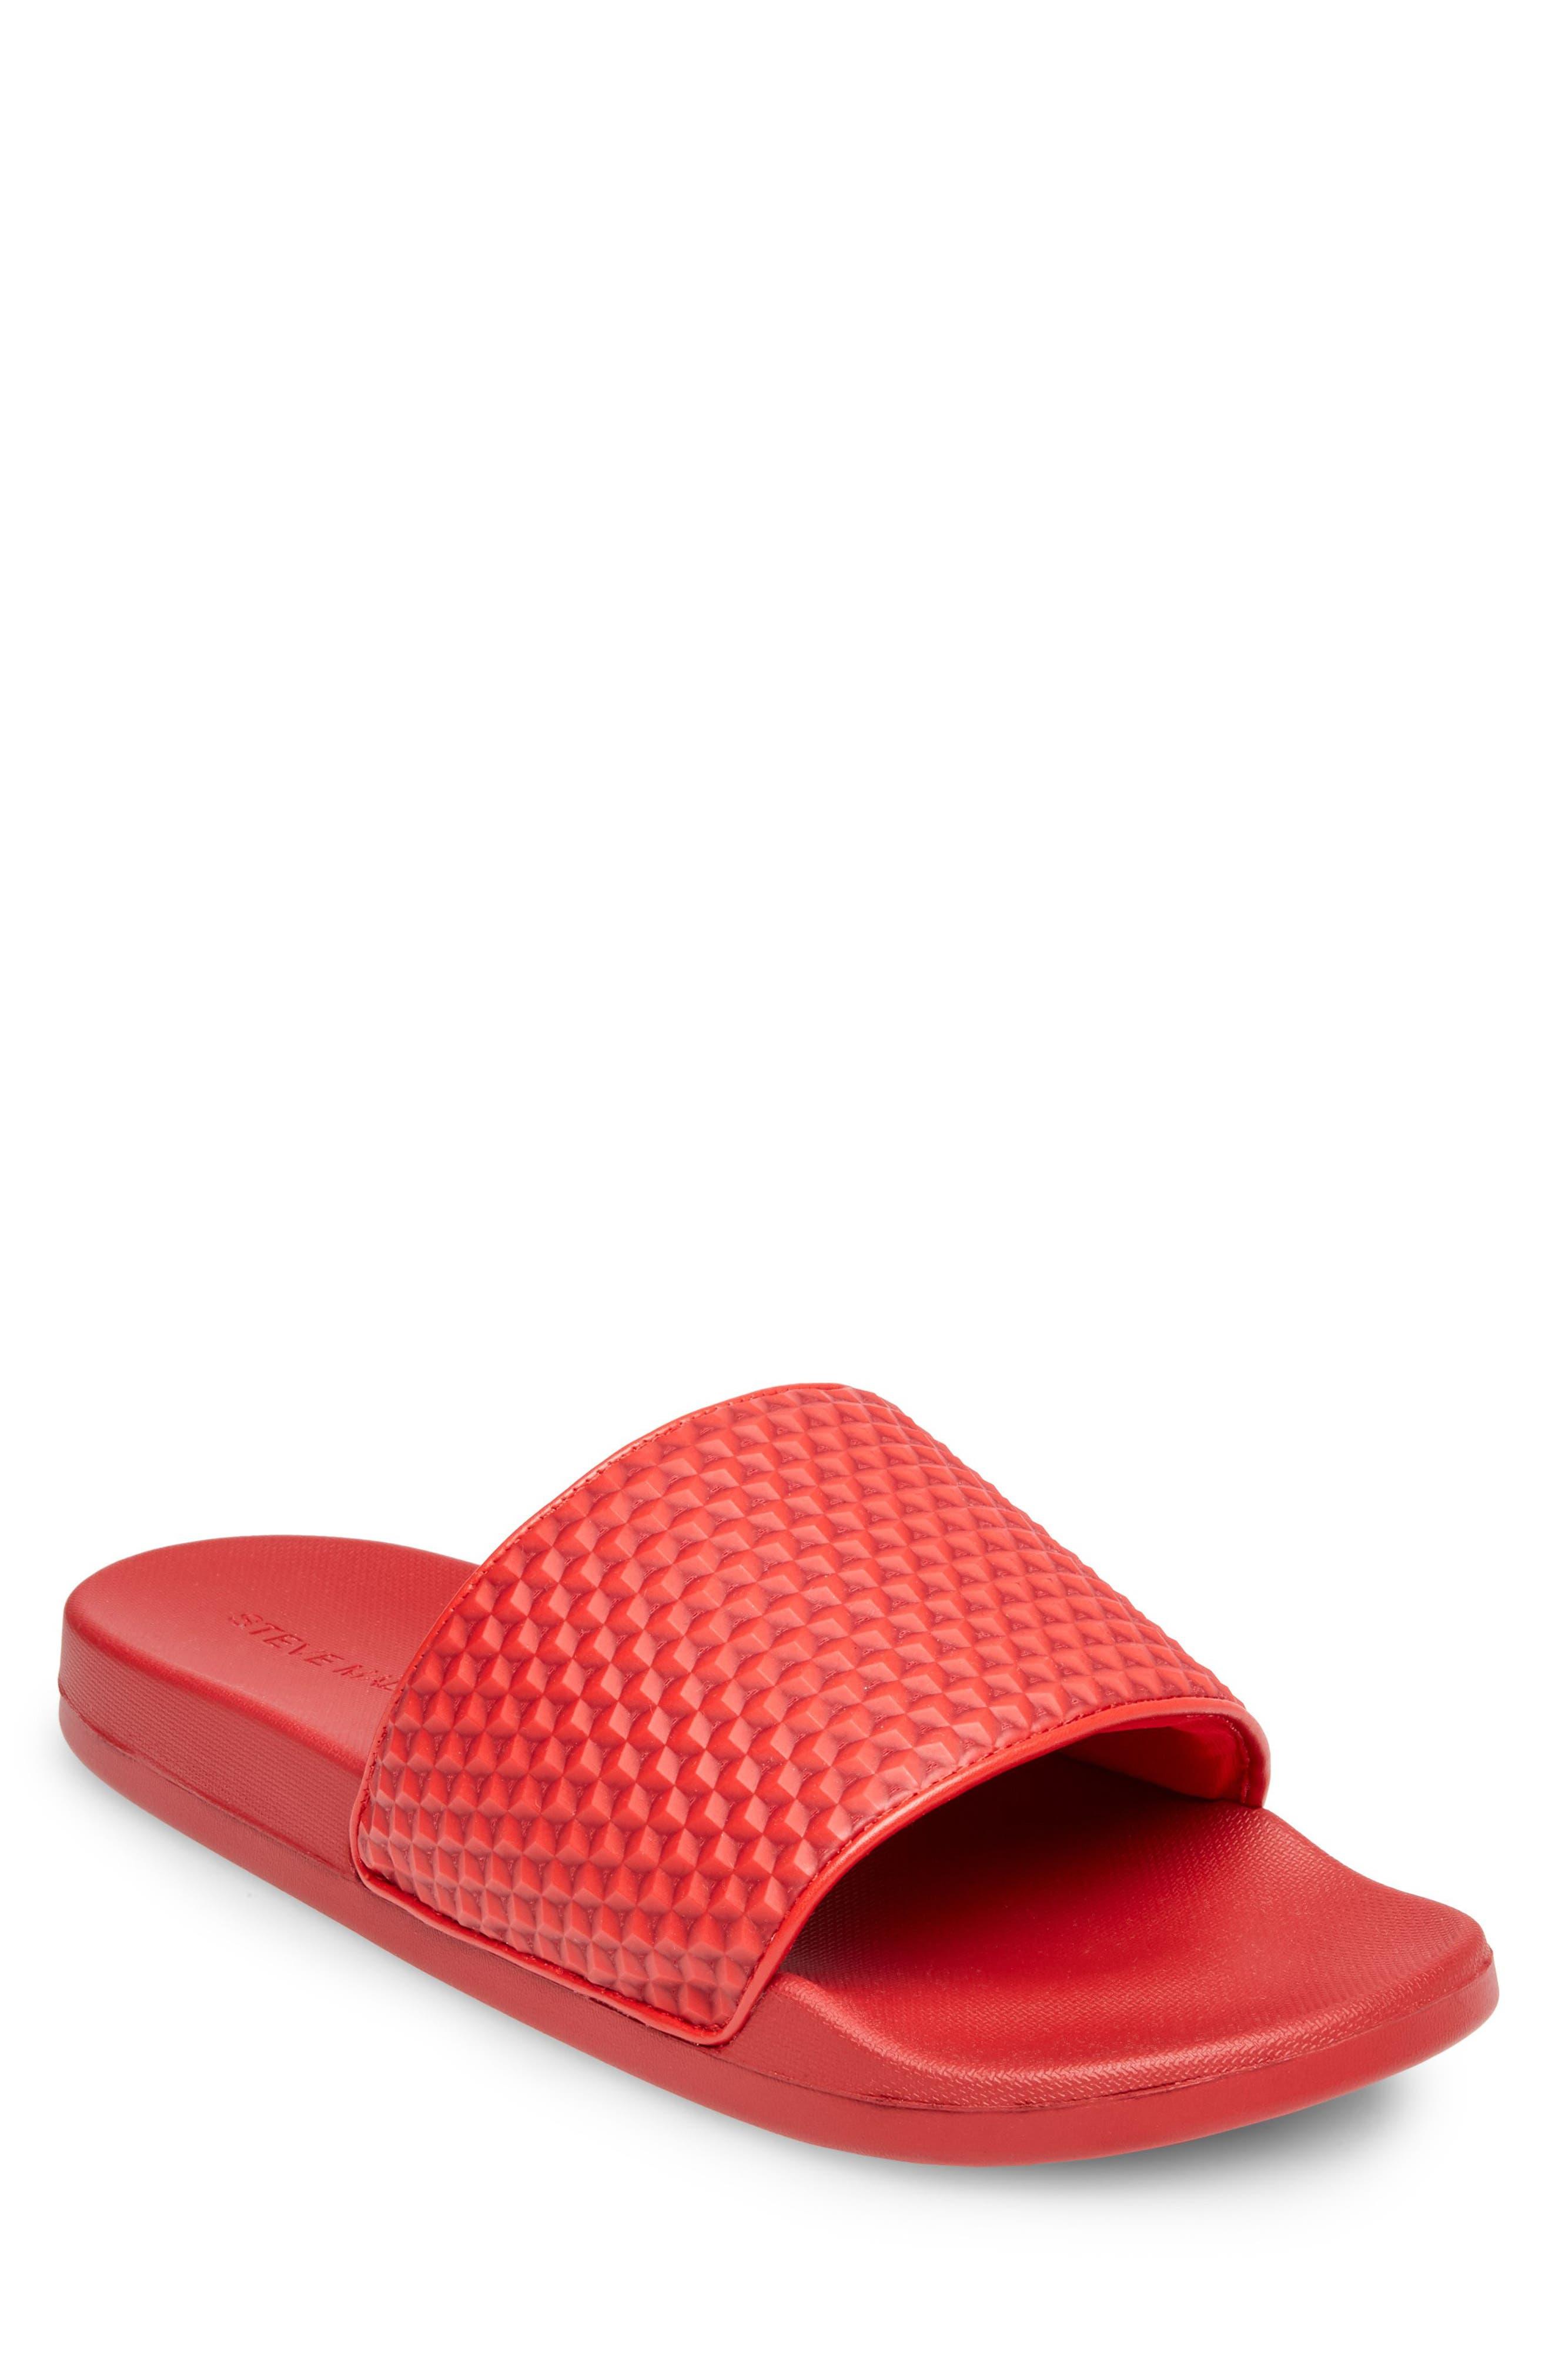 Riptide Slide Sandal,                             Main thumbnail 1, color,                             Red